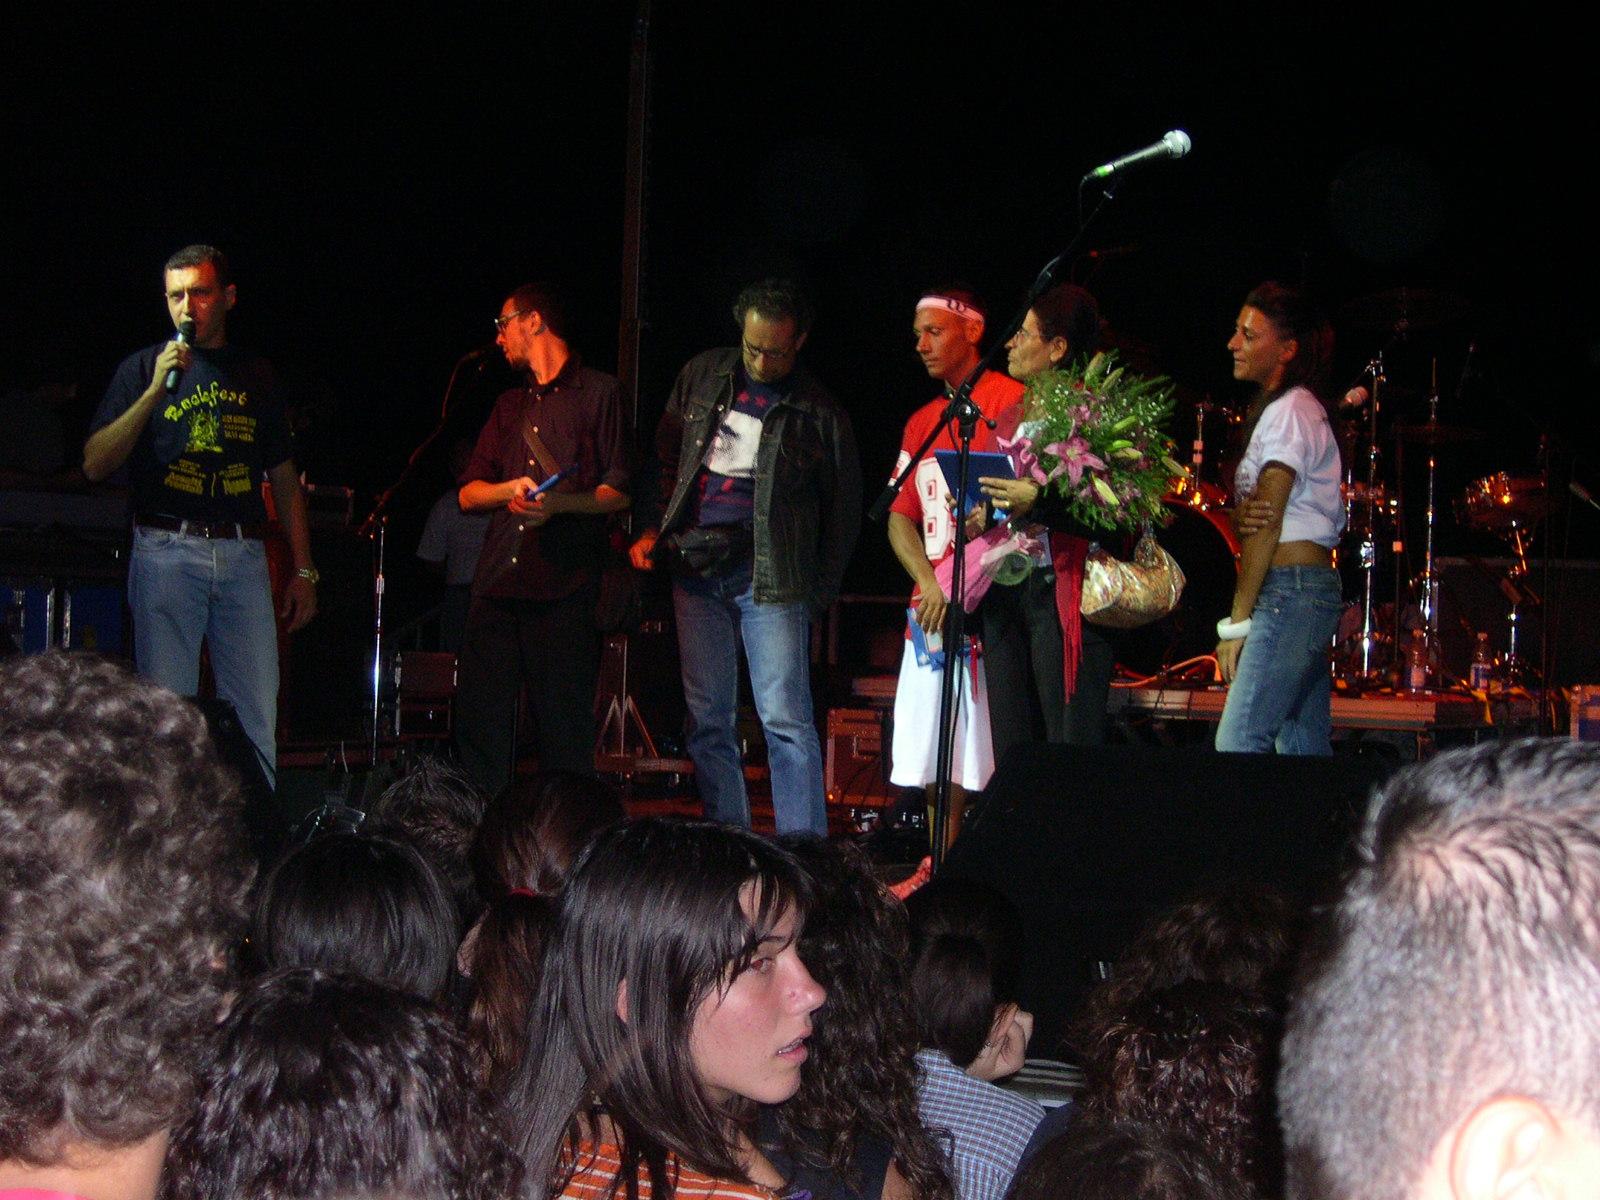 Crookers al festival Tomorrowland - crookers djset